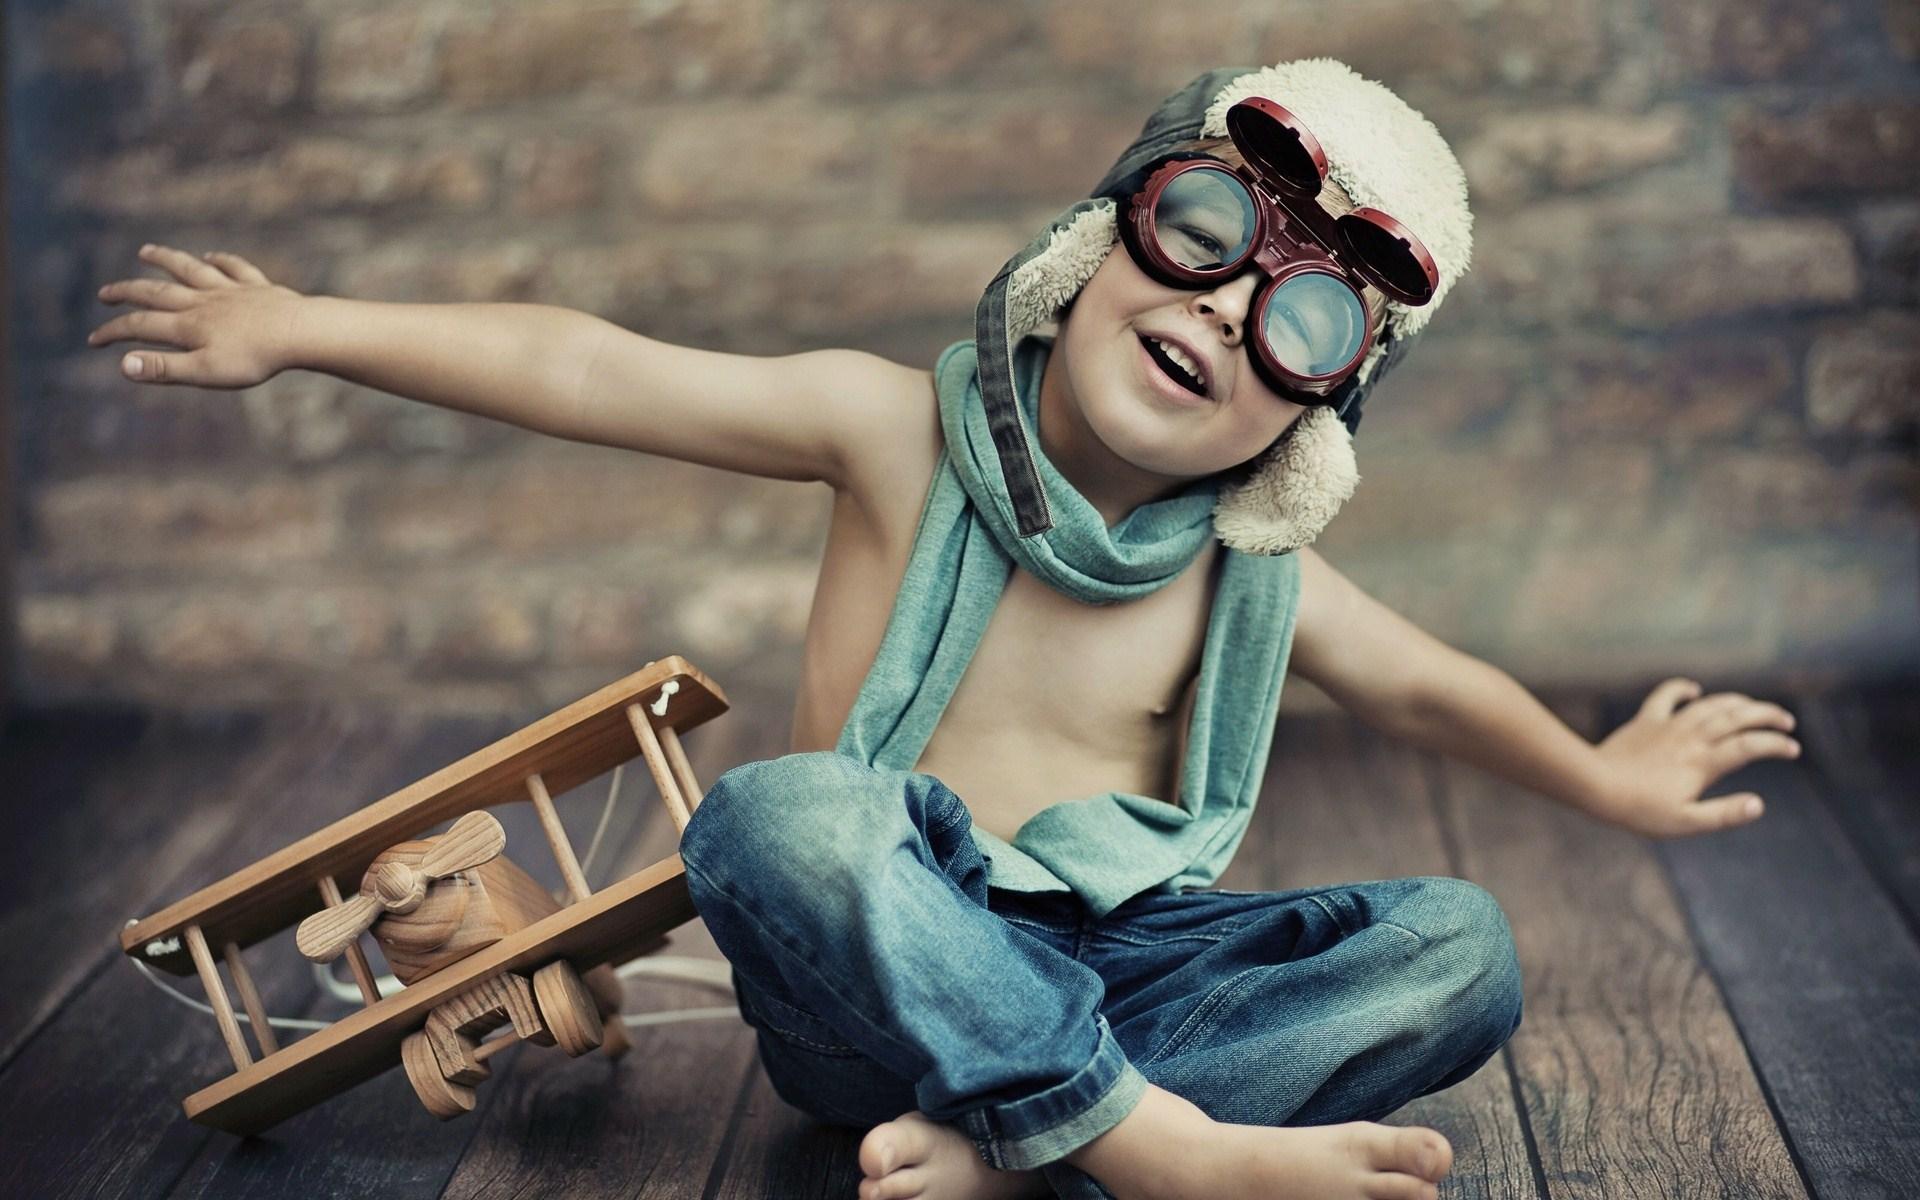 child-wooden-airplane-aviator-wide-hd-wallpaper